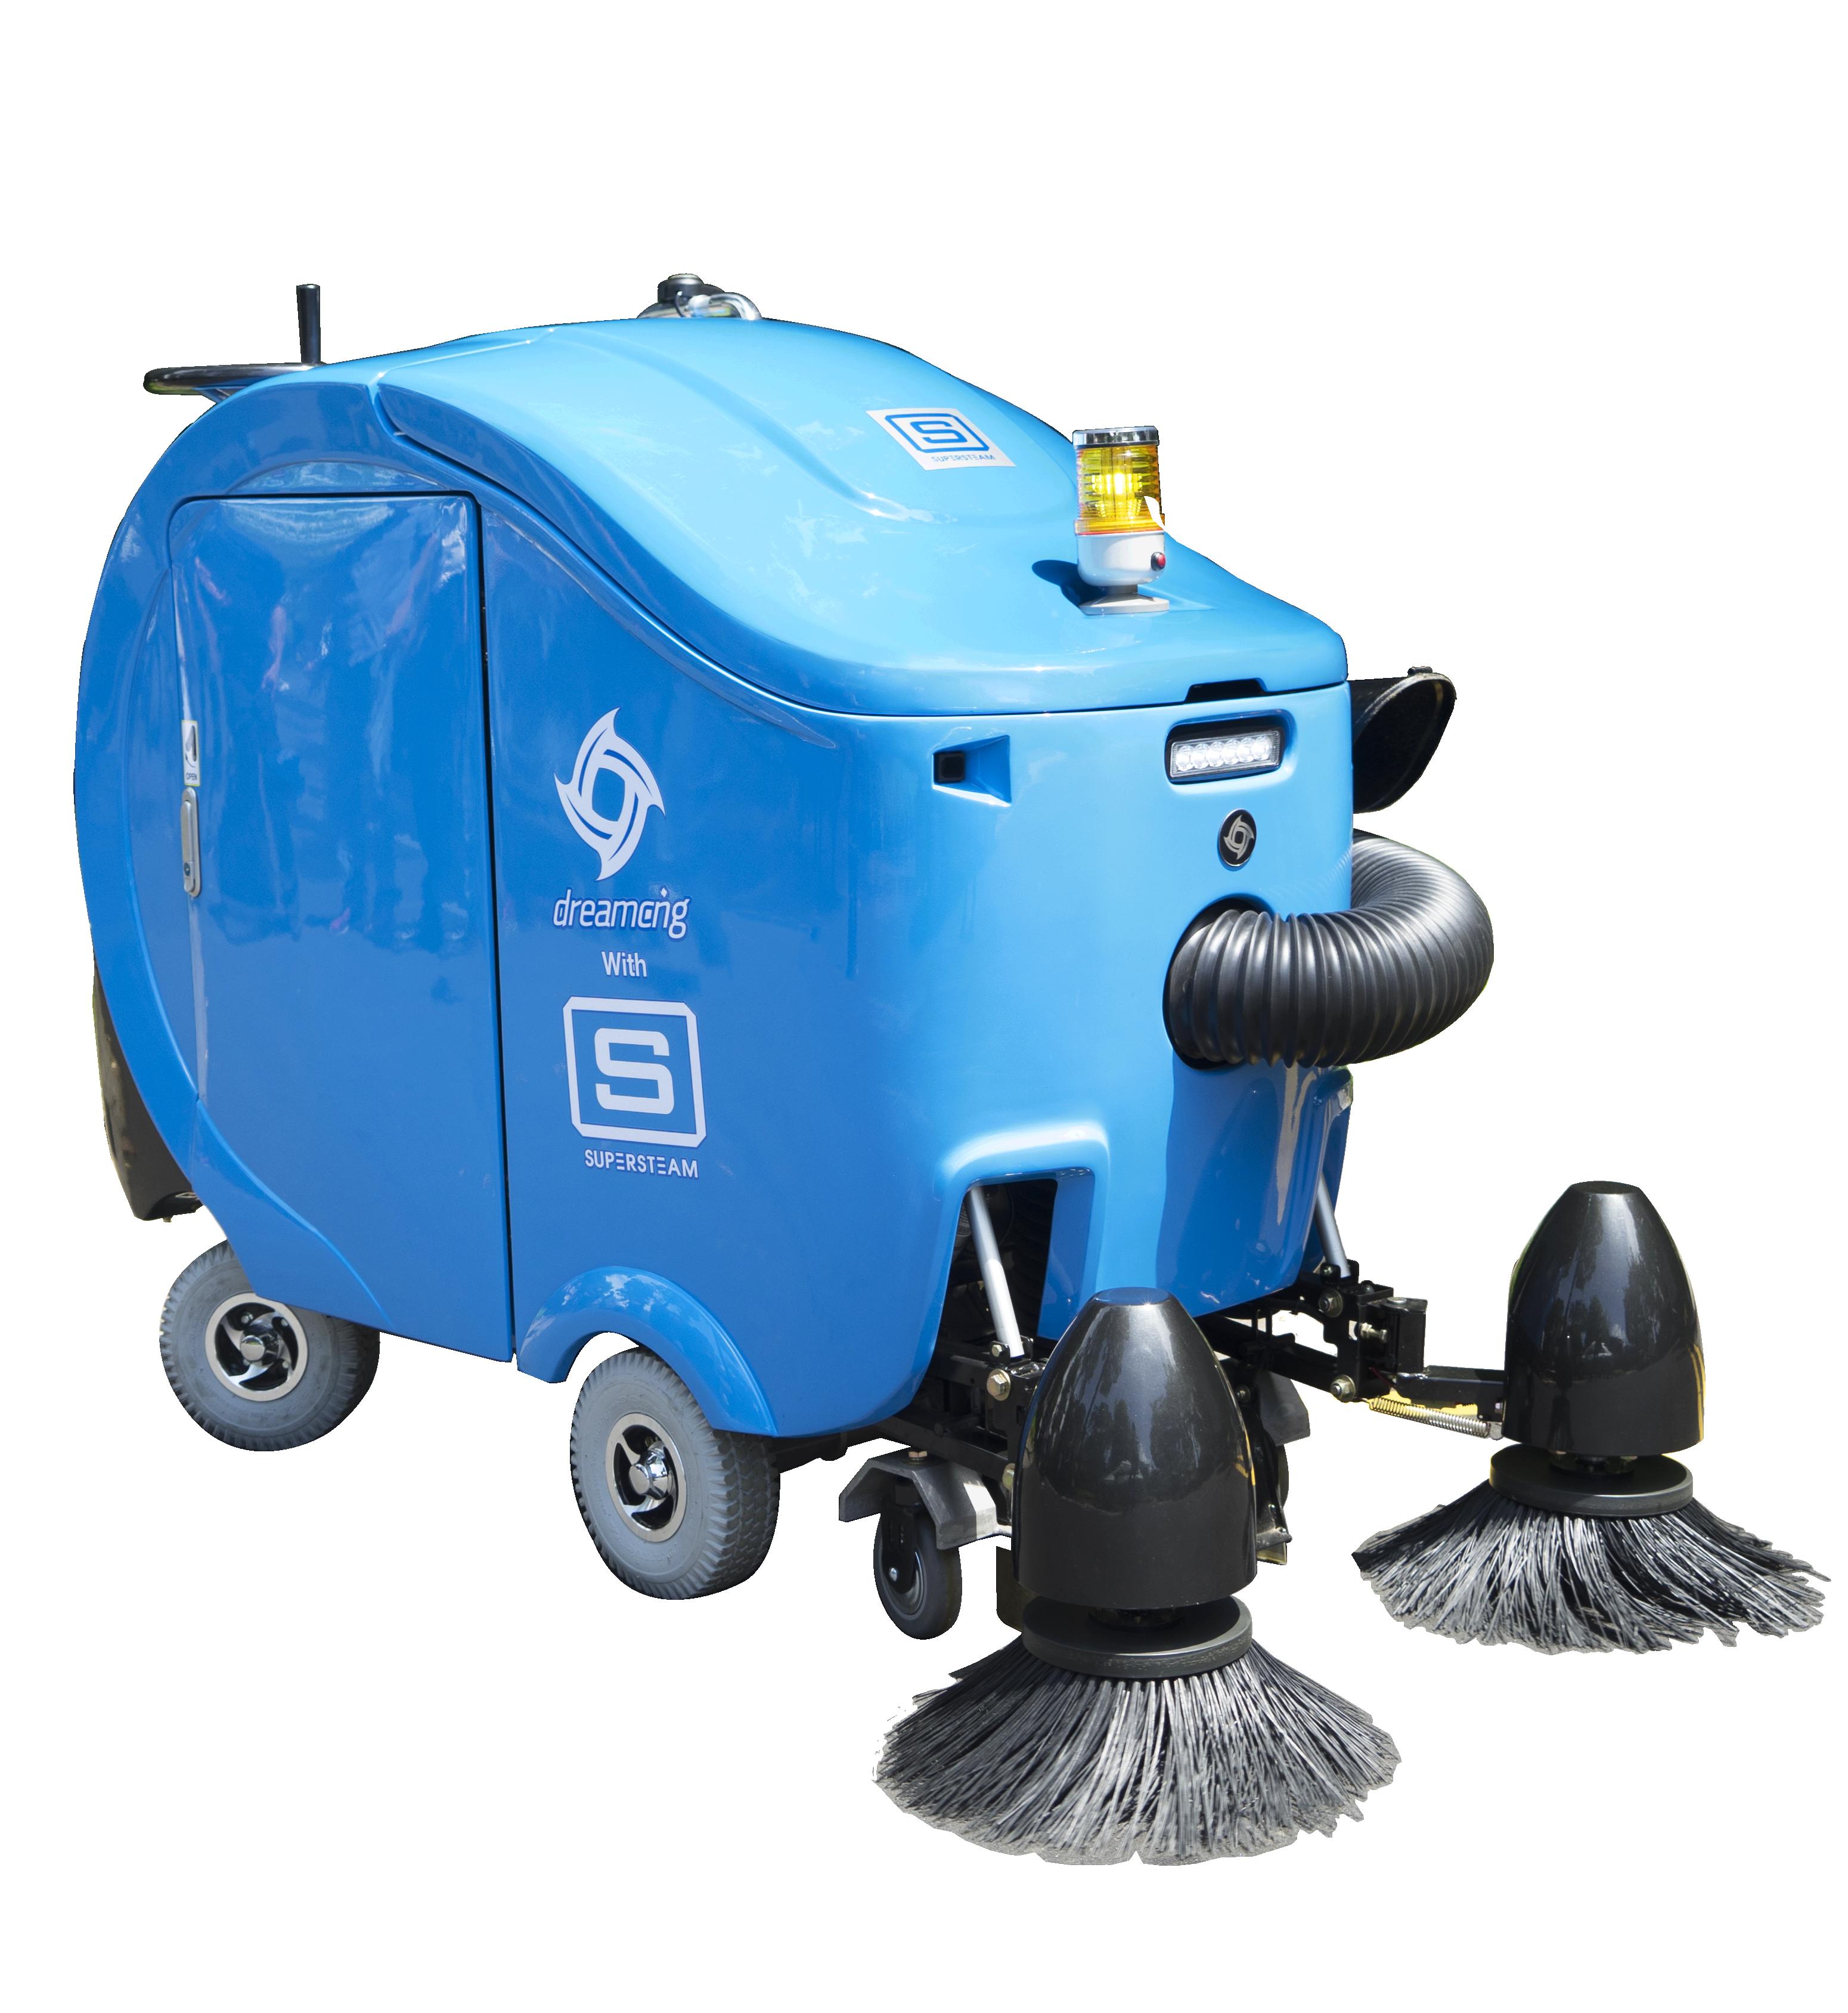 Dream Robotic Suction Sweeper Singapore Supersteam